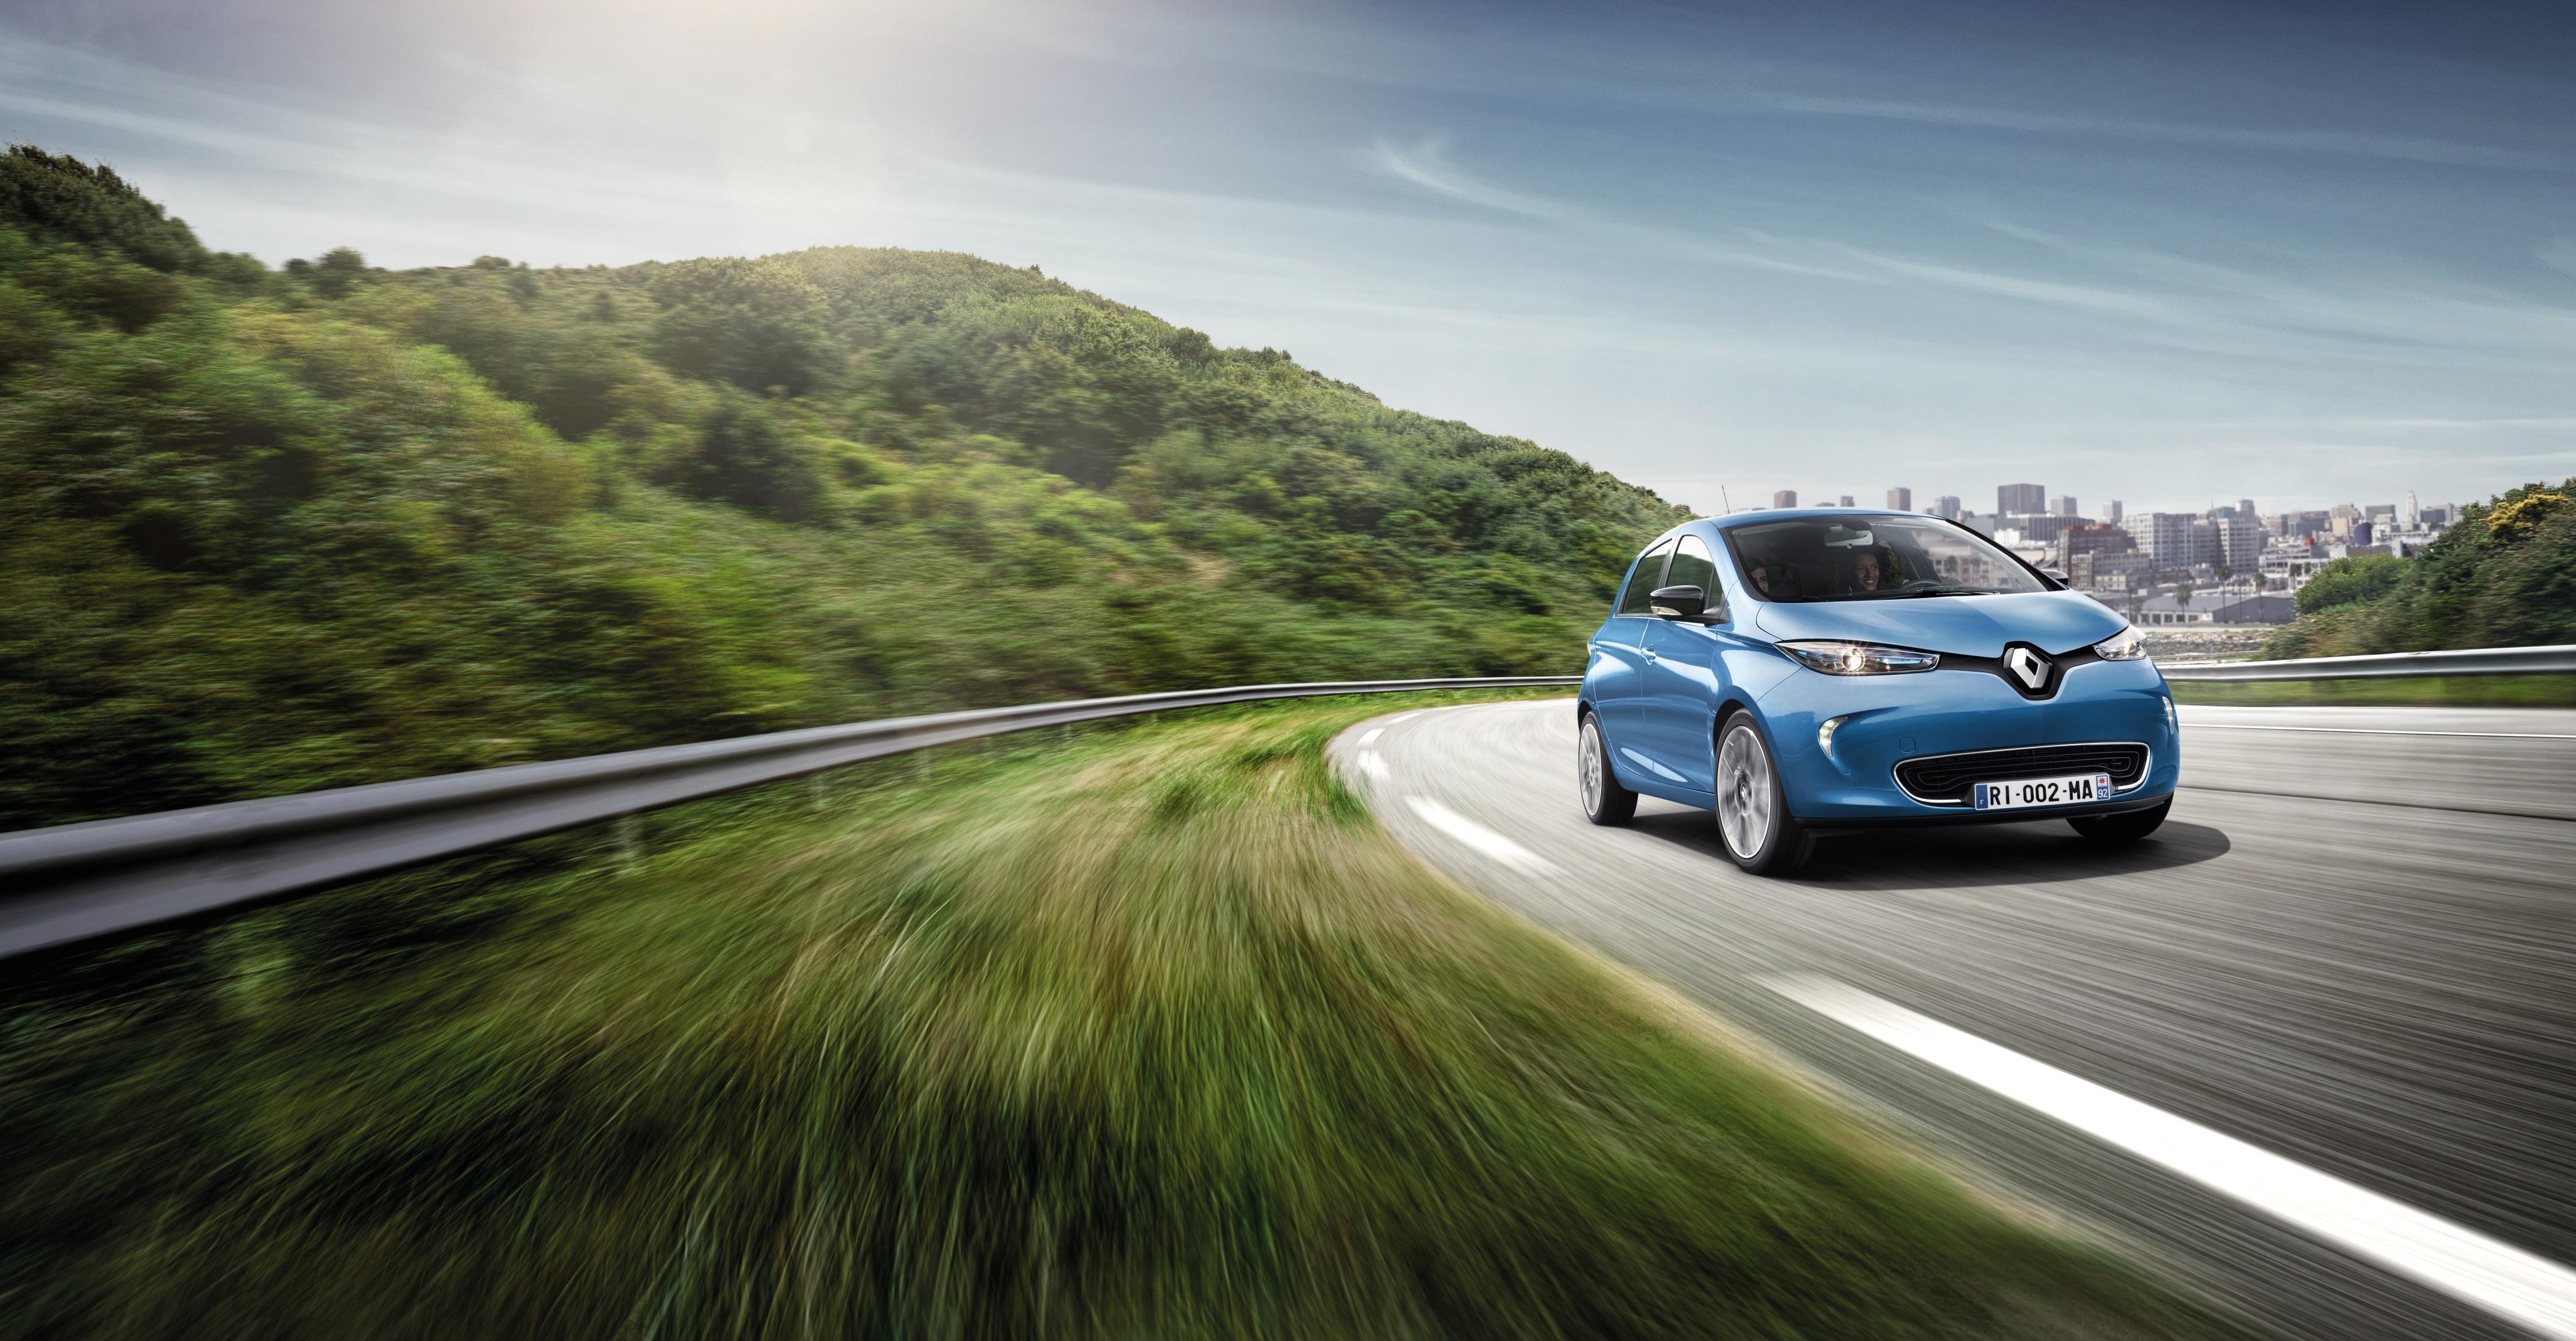 Renault thiết lập kỷ lục mới tại triển lãm Paris Motorshow